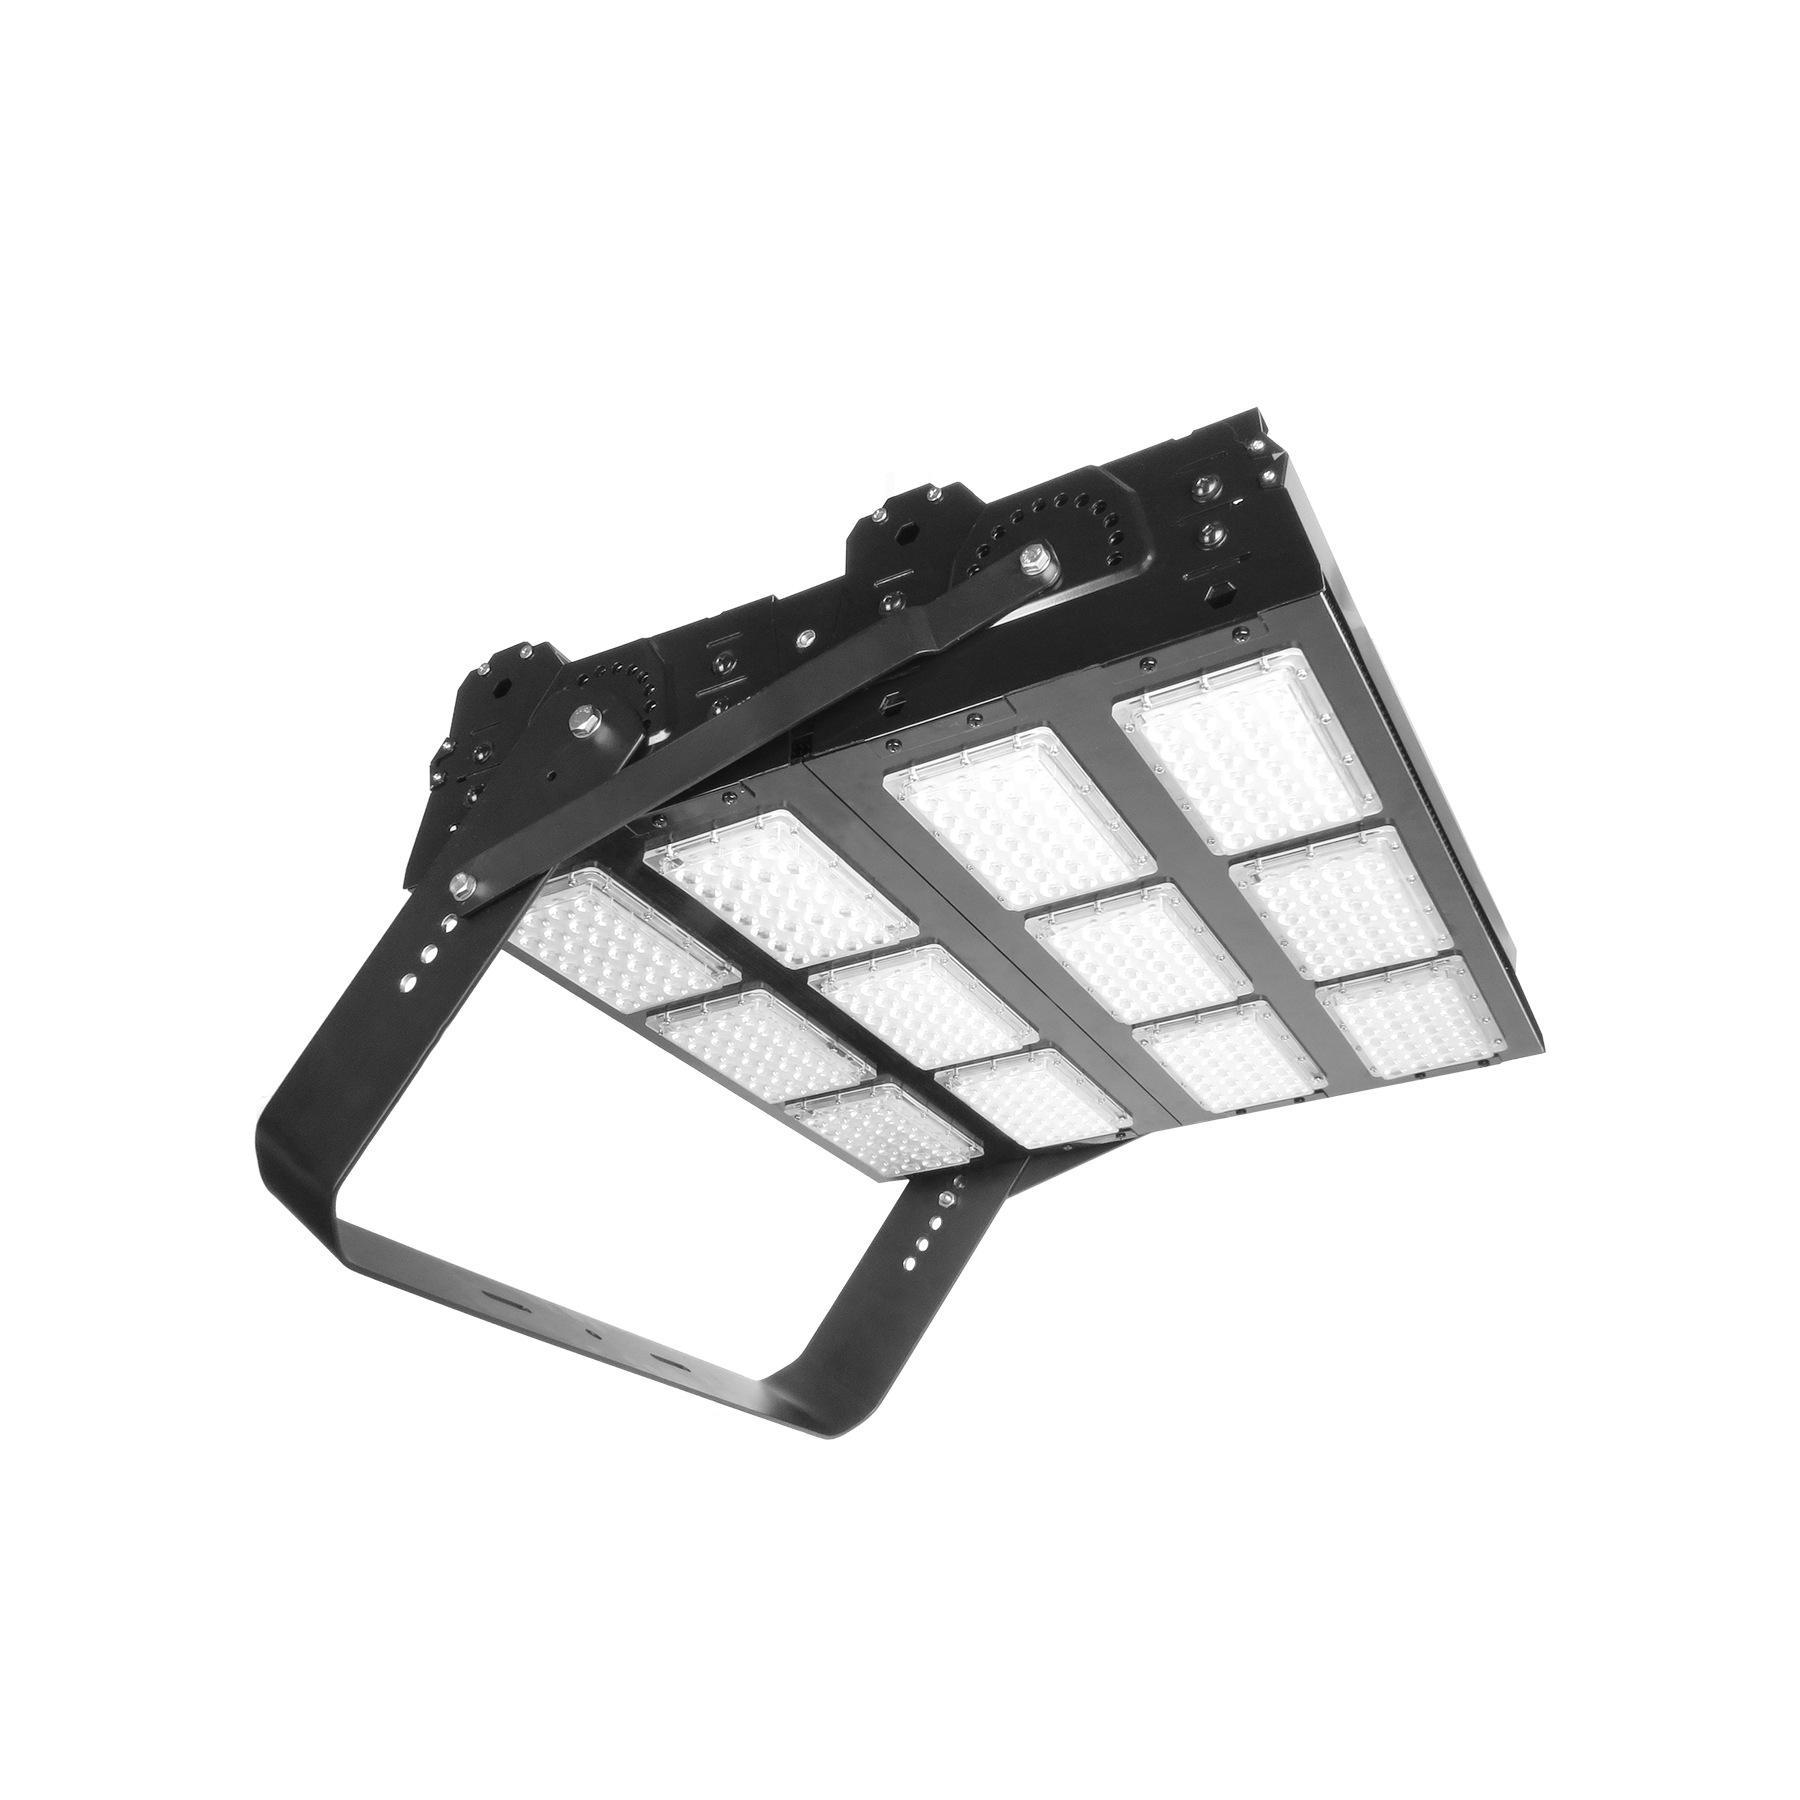 1000W 120LM/W IP65 IP66 LED Floodlight stadium light Sports lighting 1